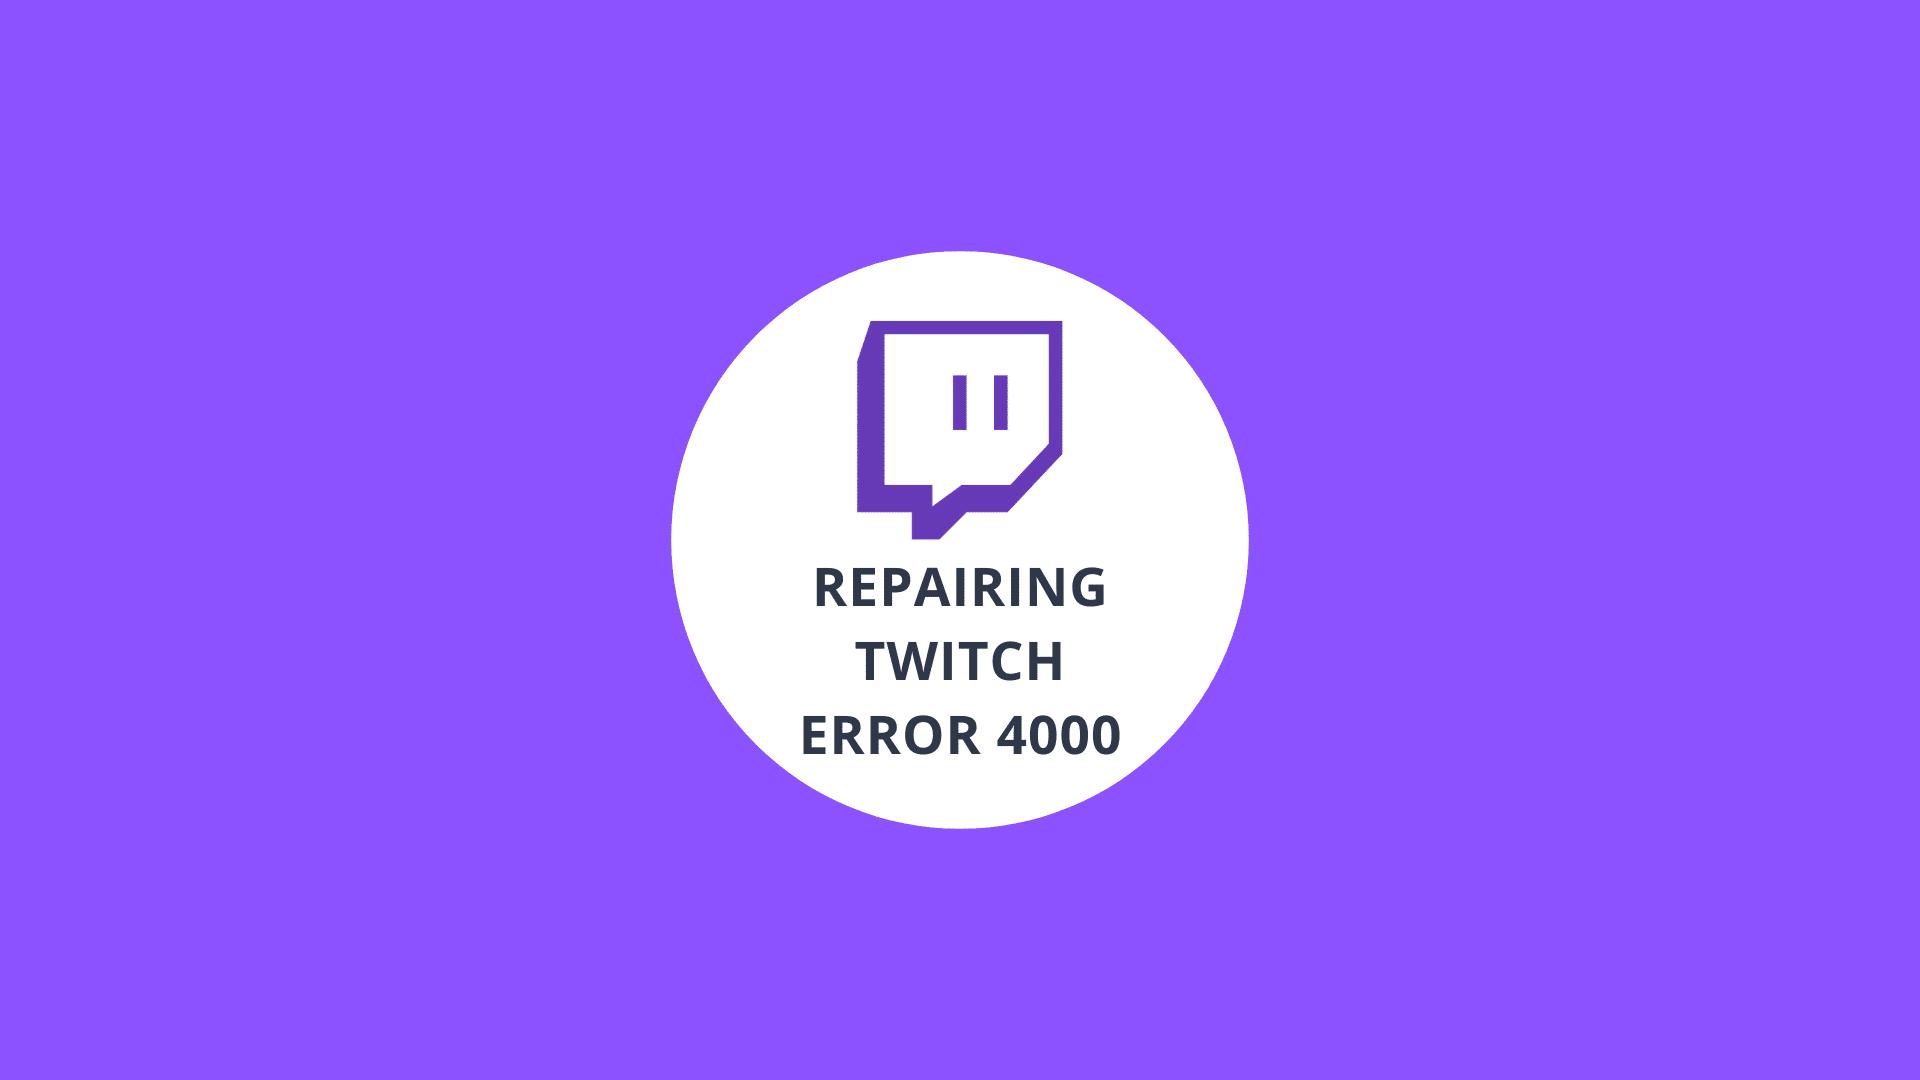 Repairing Twitch Error 4000